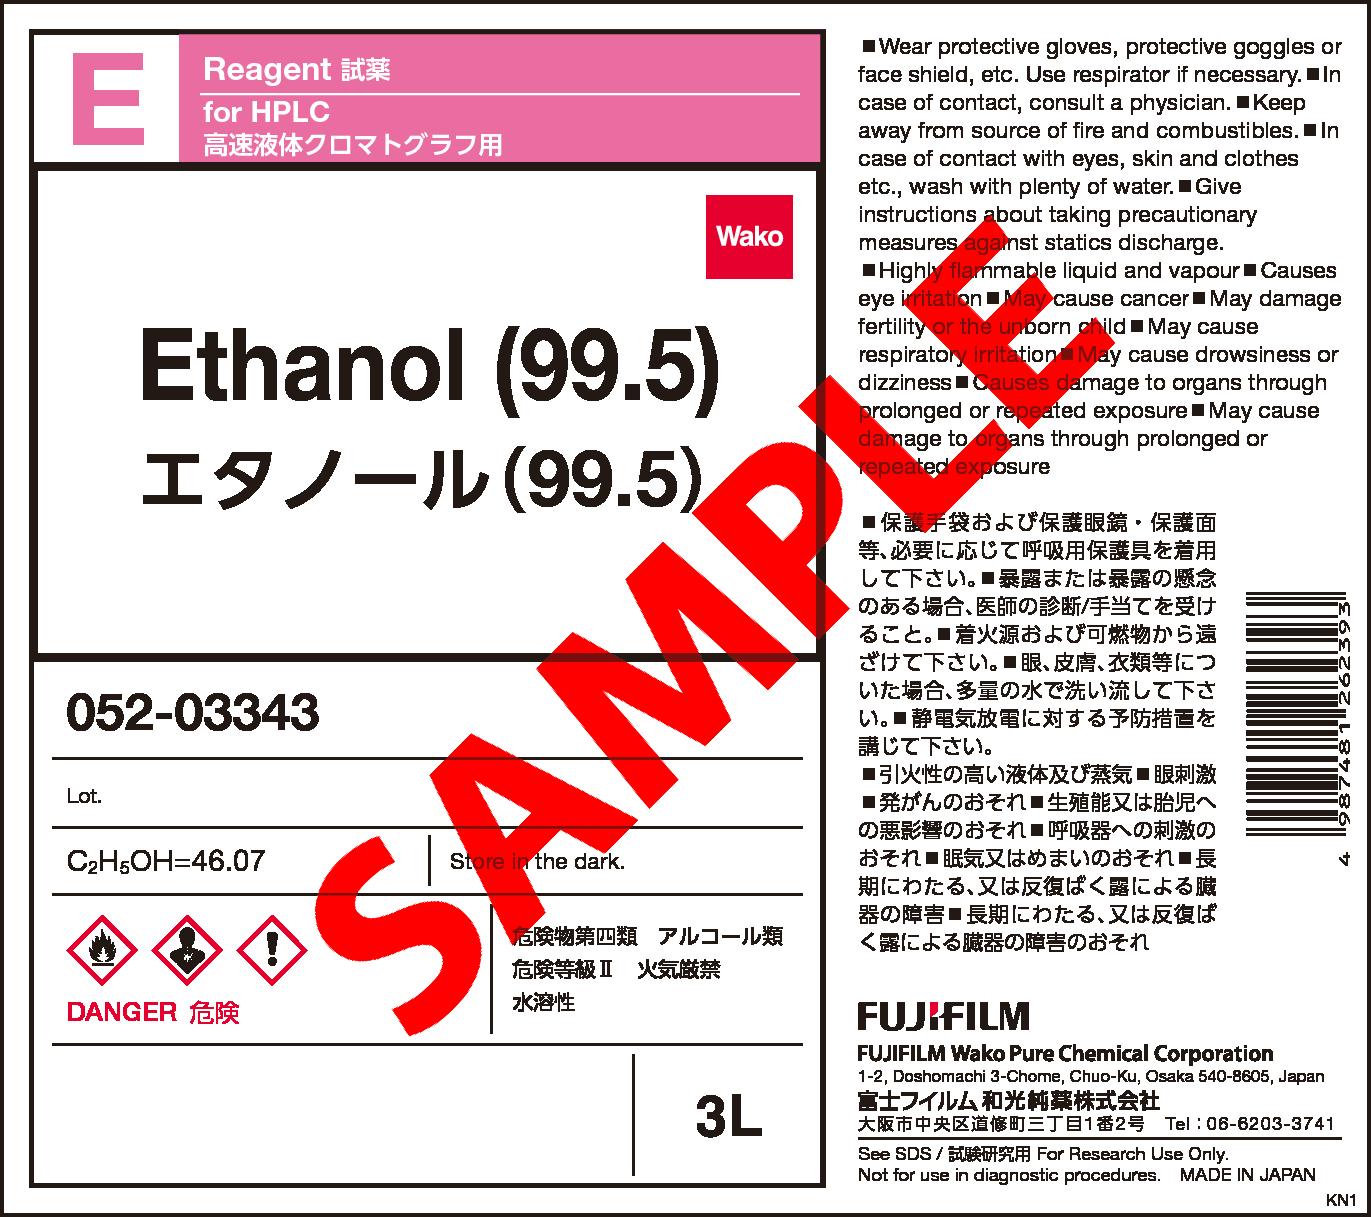 64-17-5・Ethanol (99.5)・056-03341・052-03343[Detail